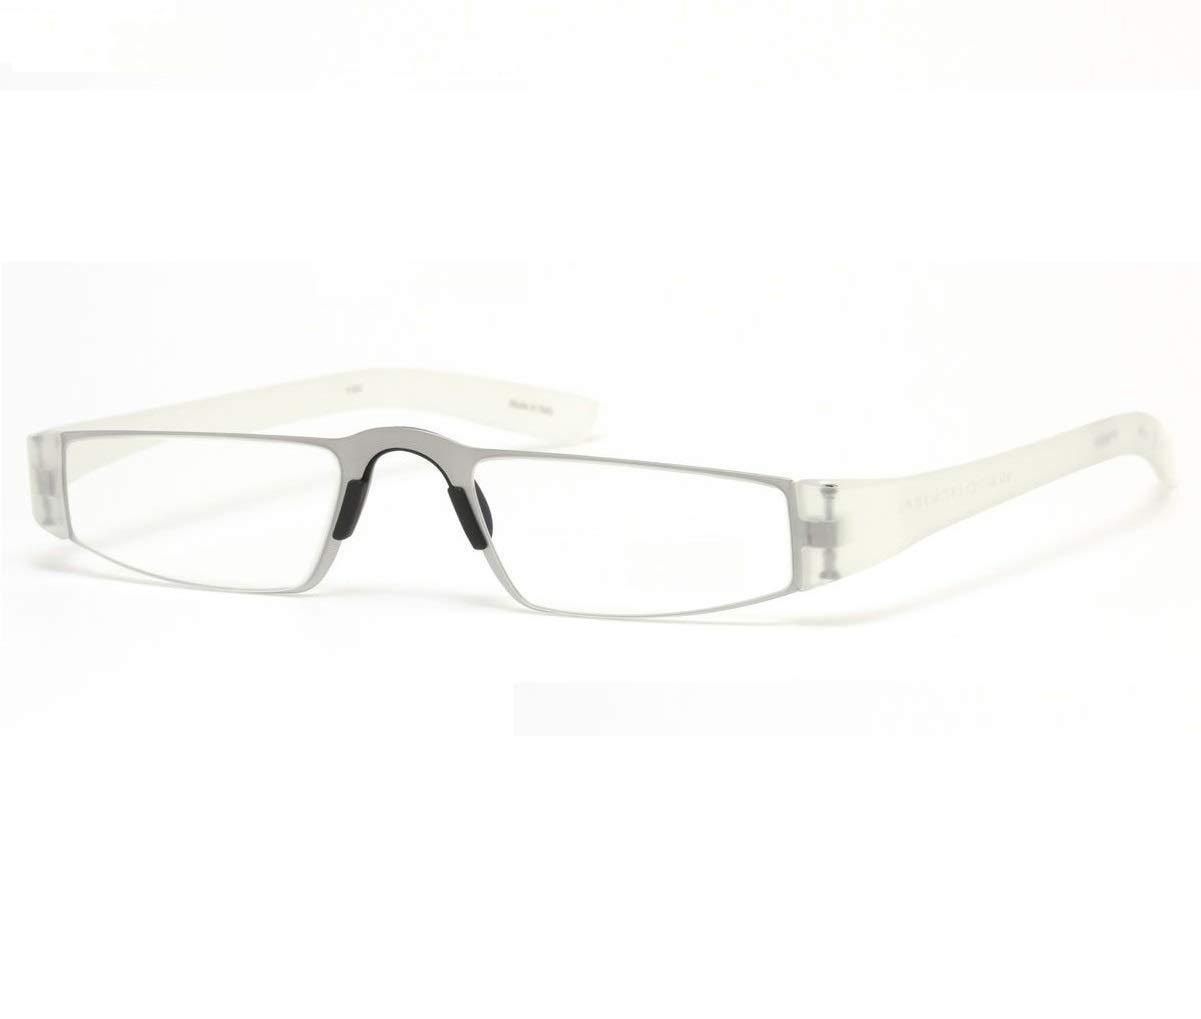 Porsche Design Reading glasses P8801M +2.00 Transparent